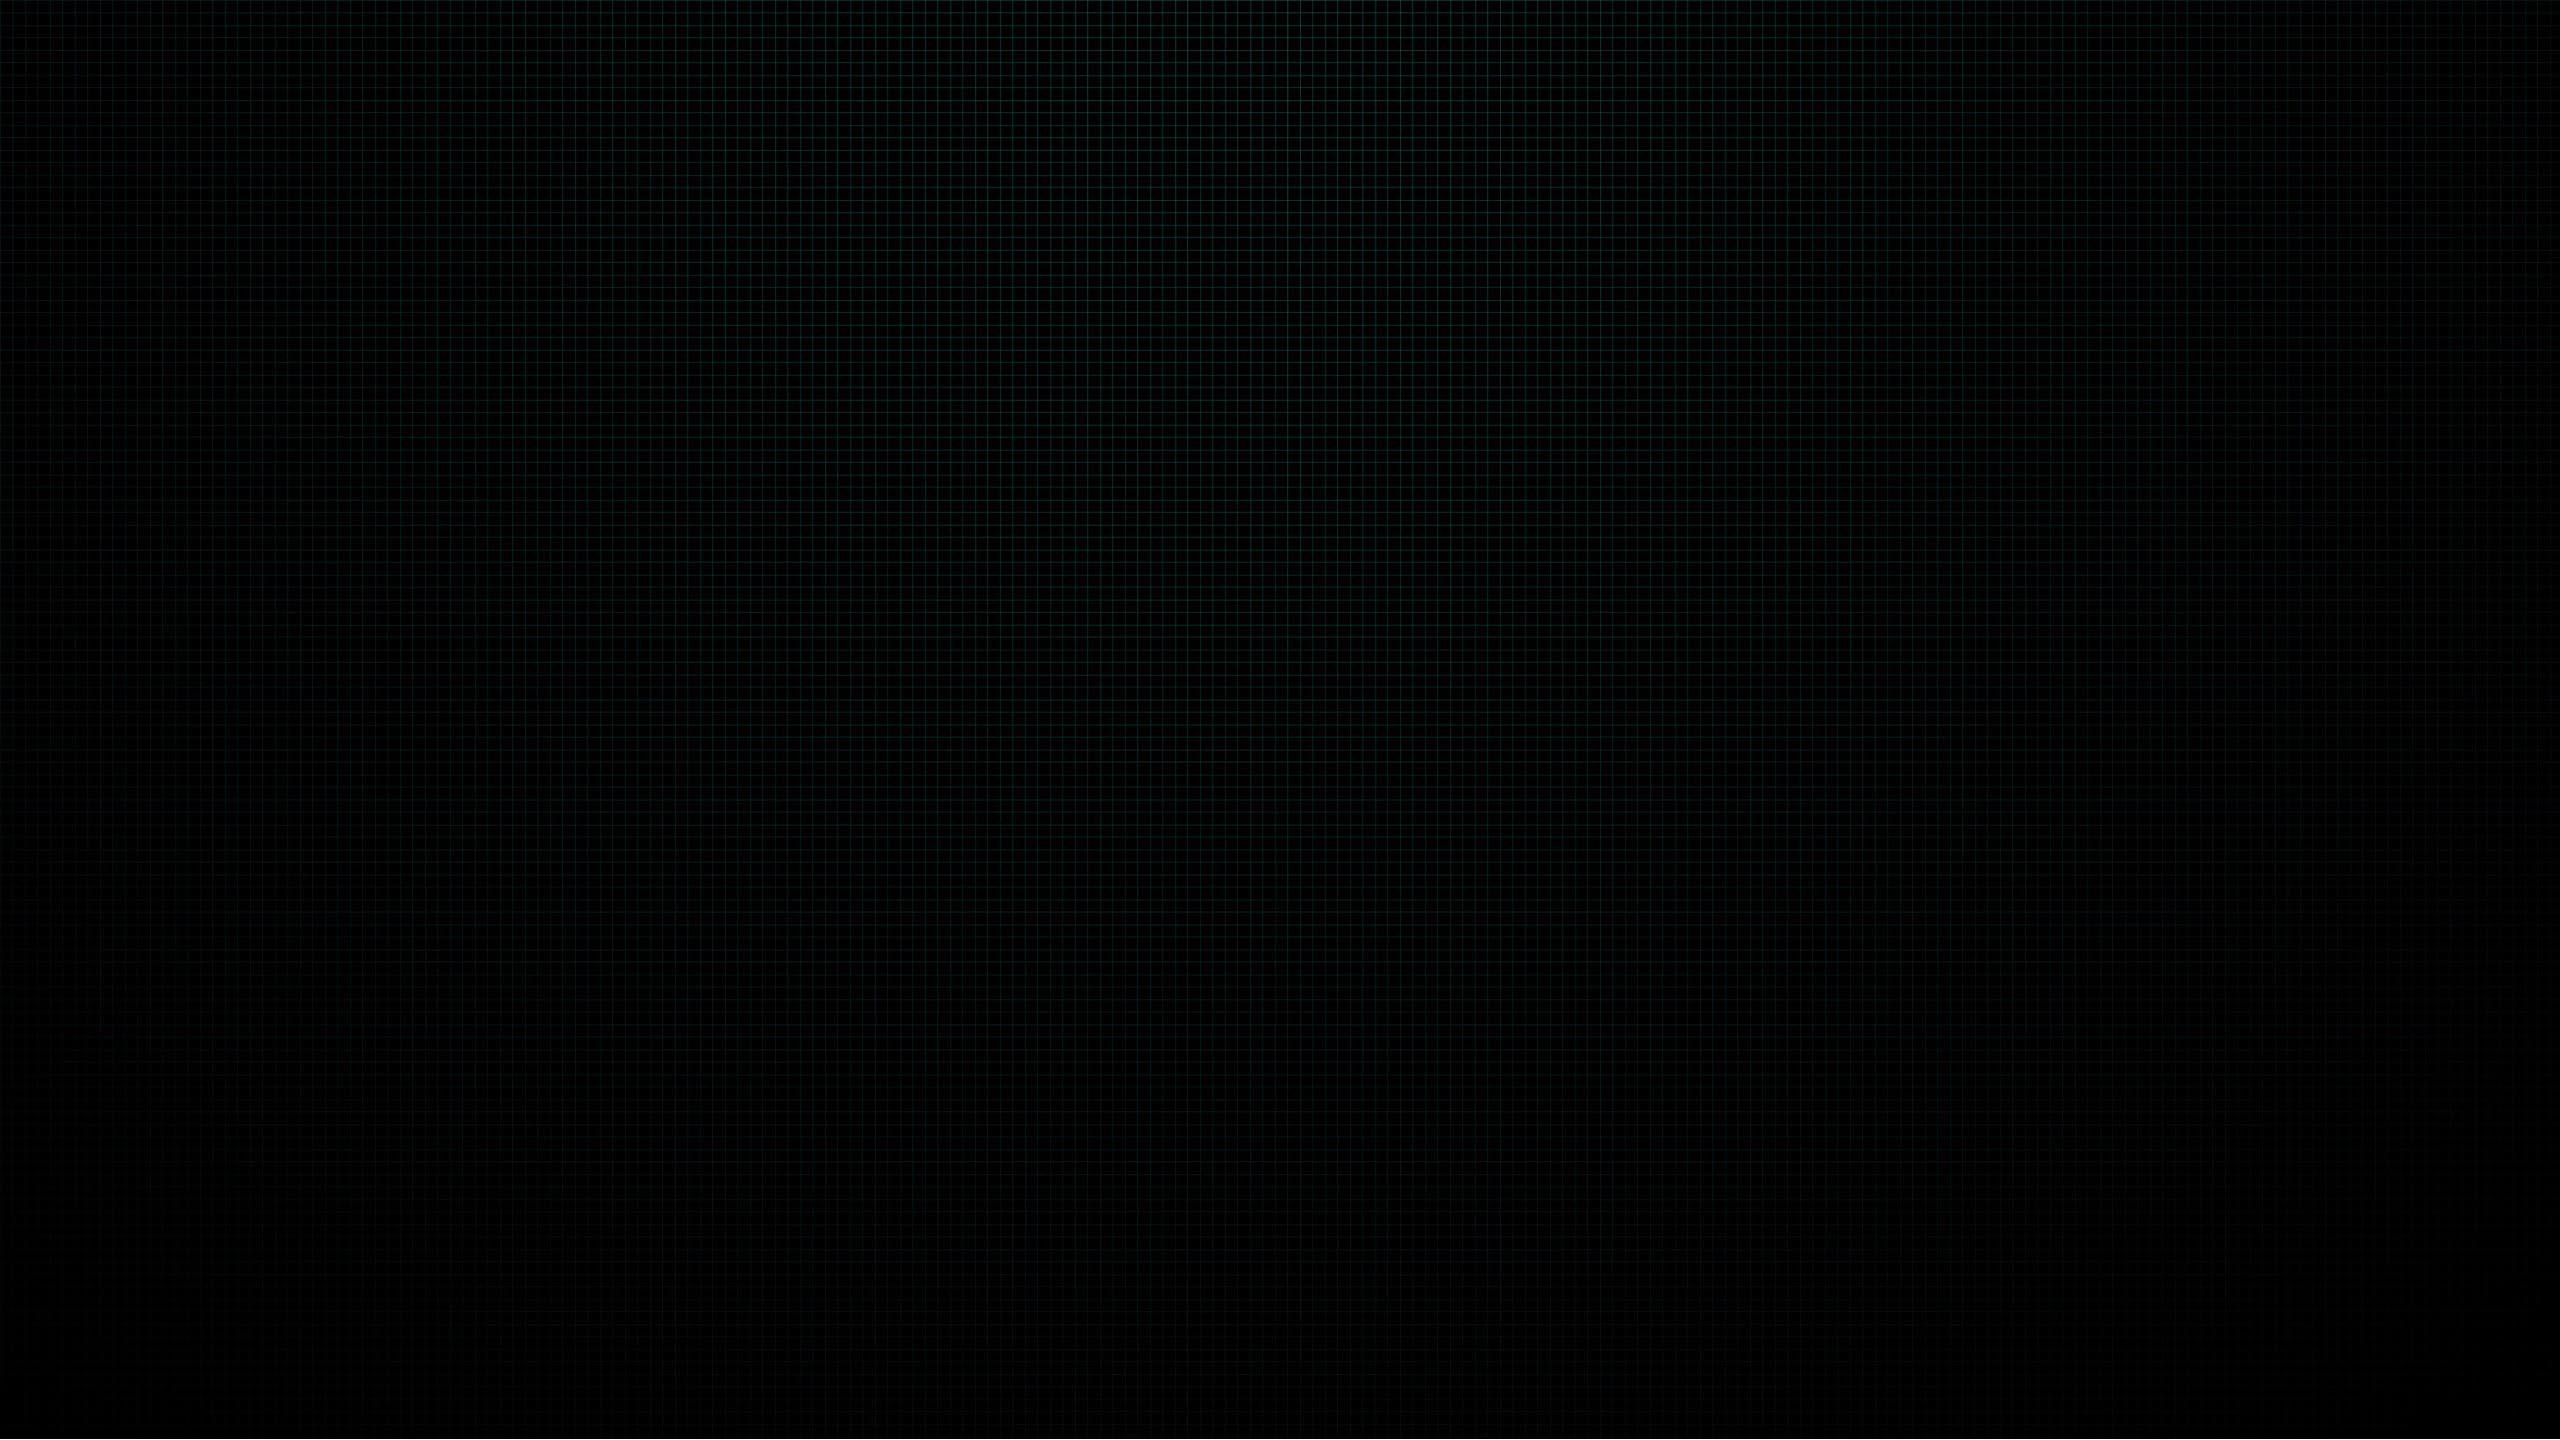 full black wallpaper - HD